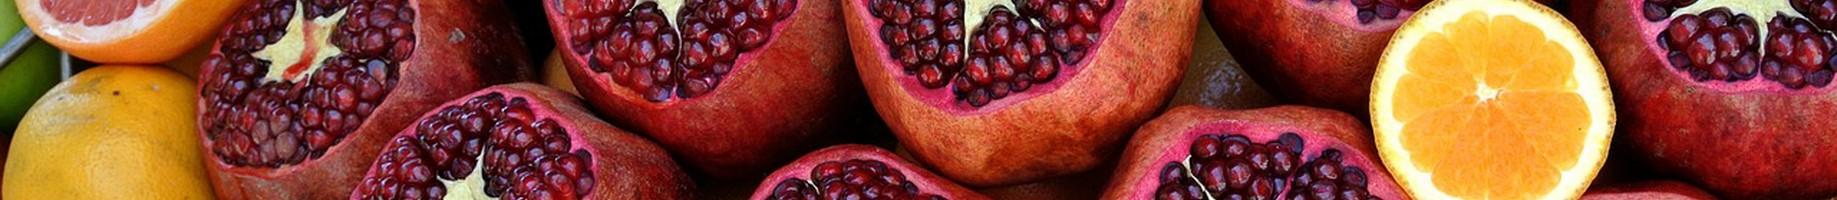 grapefruit-2630578_1280